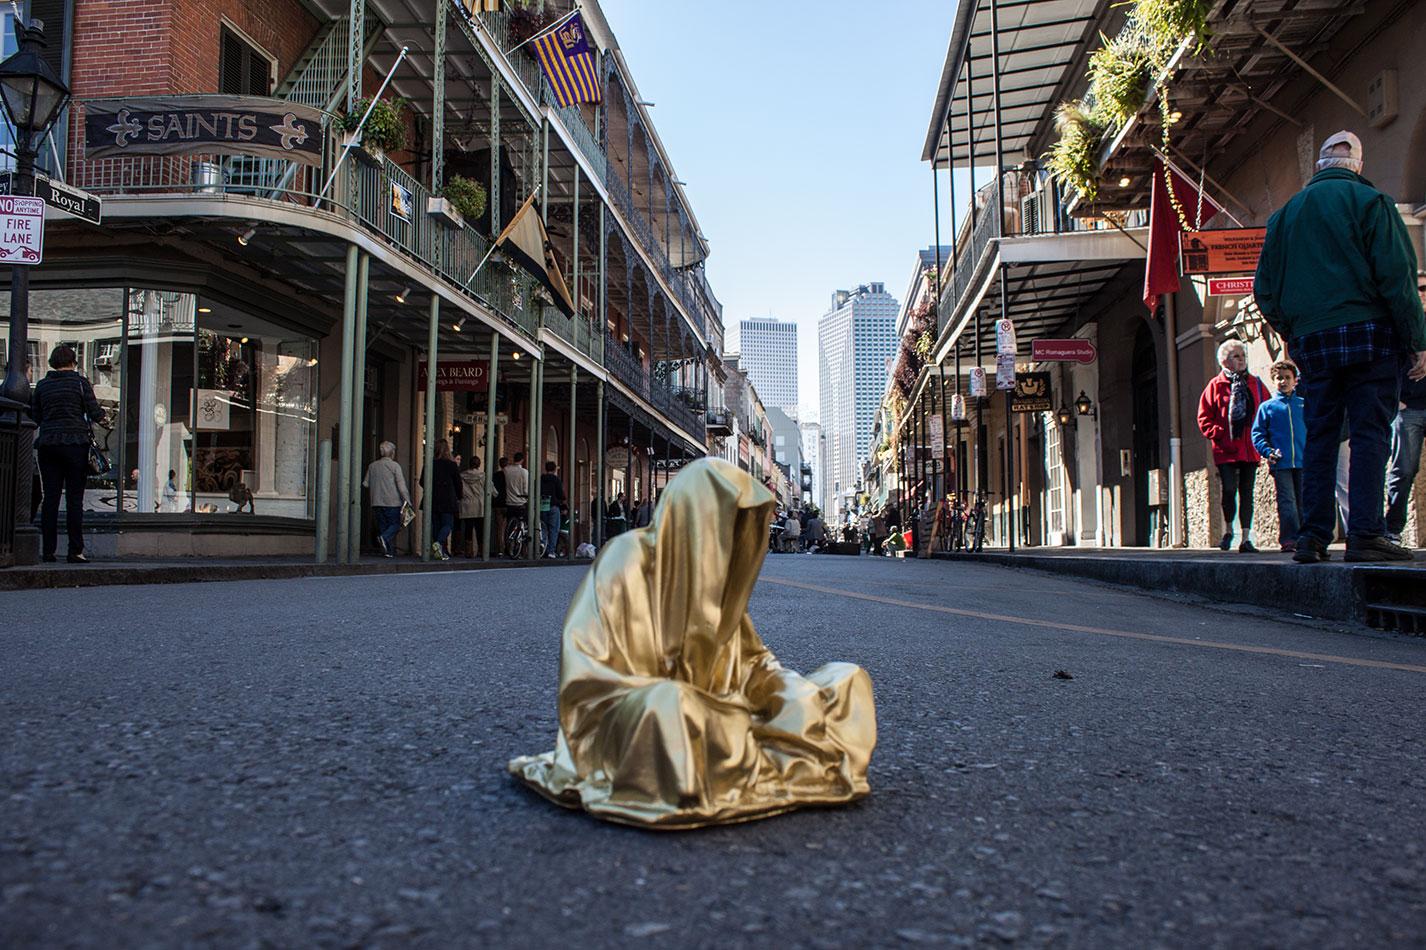 public-art-show-New-Orleans-Louisiana-usa-guardians-of-time-manfred-kili-kielnhofer-contemporary-fine-art-modern-arts-design-antiques-sculpture-5405